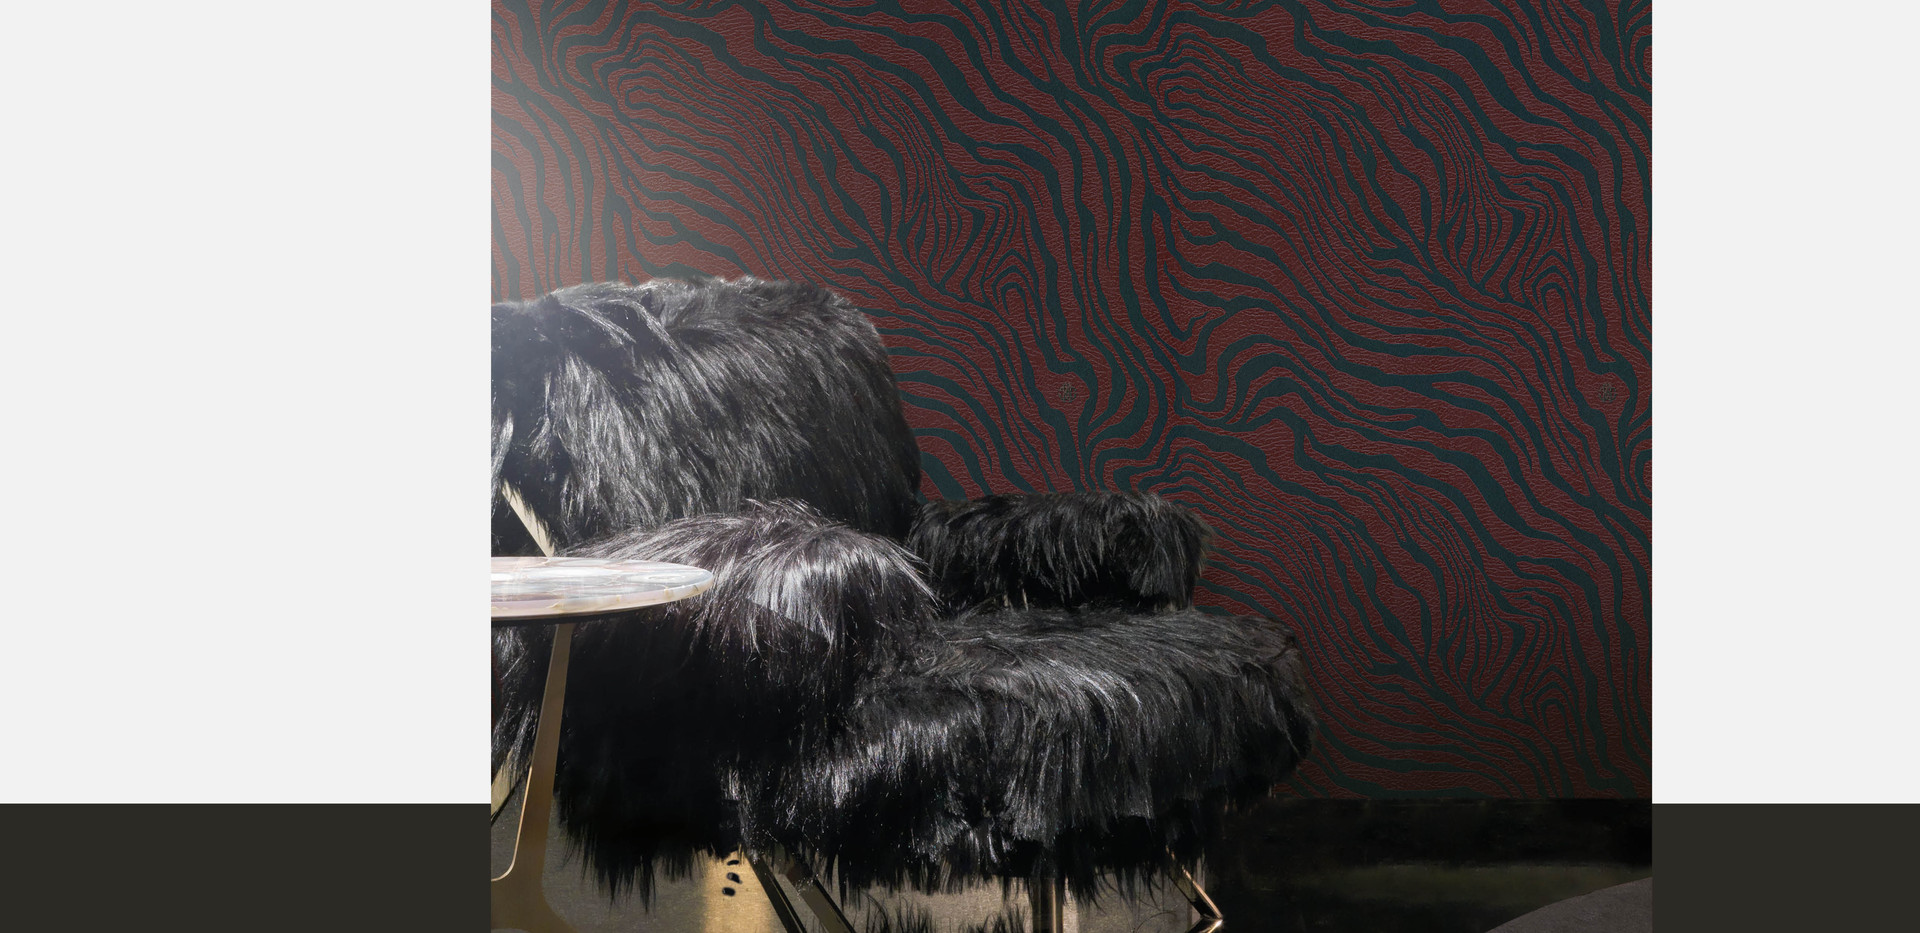 LifeNcolors-best-wallpaper-branded-luxury-pattern-texture-dark